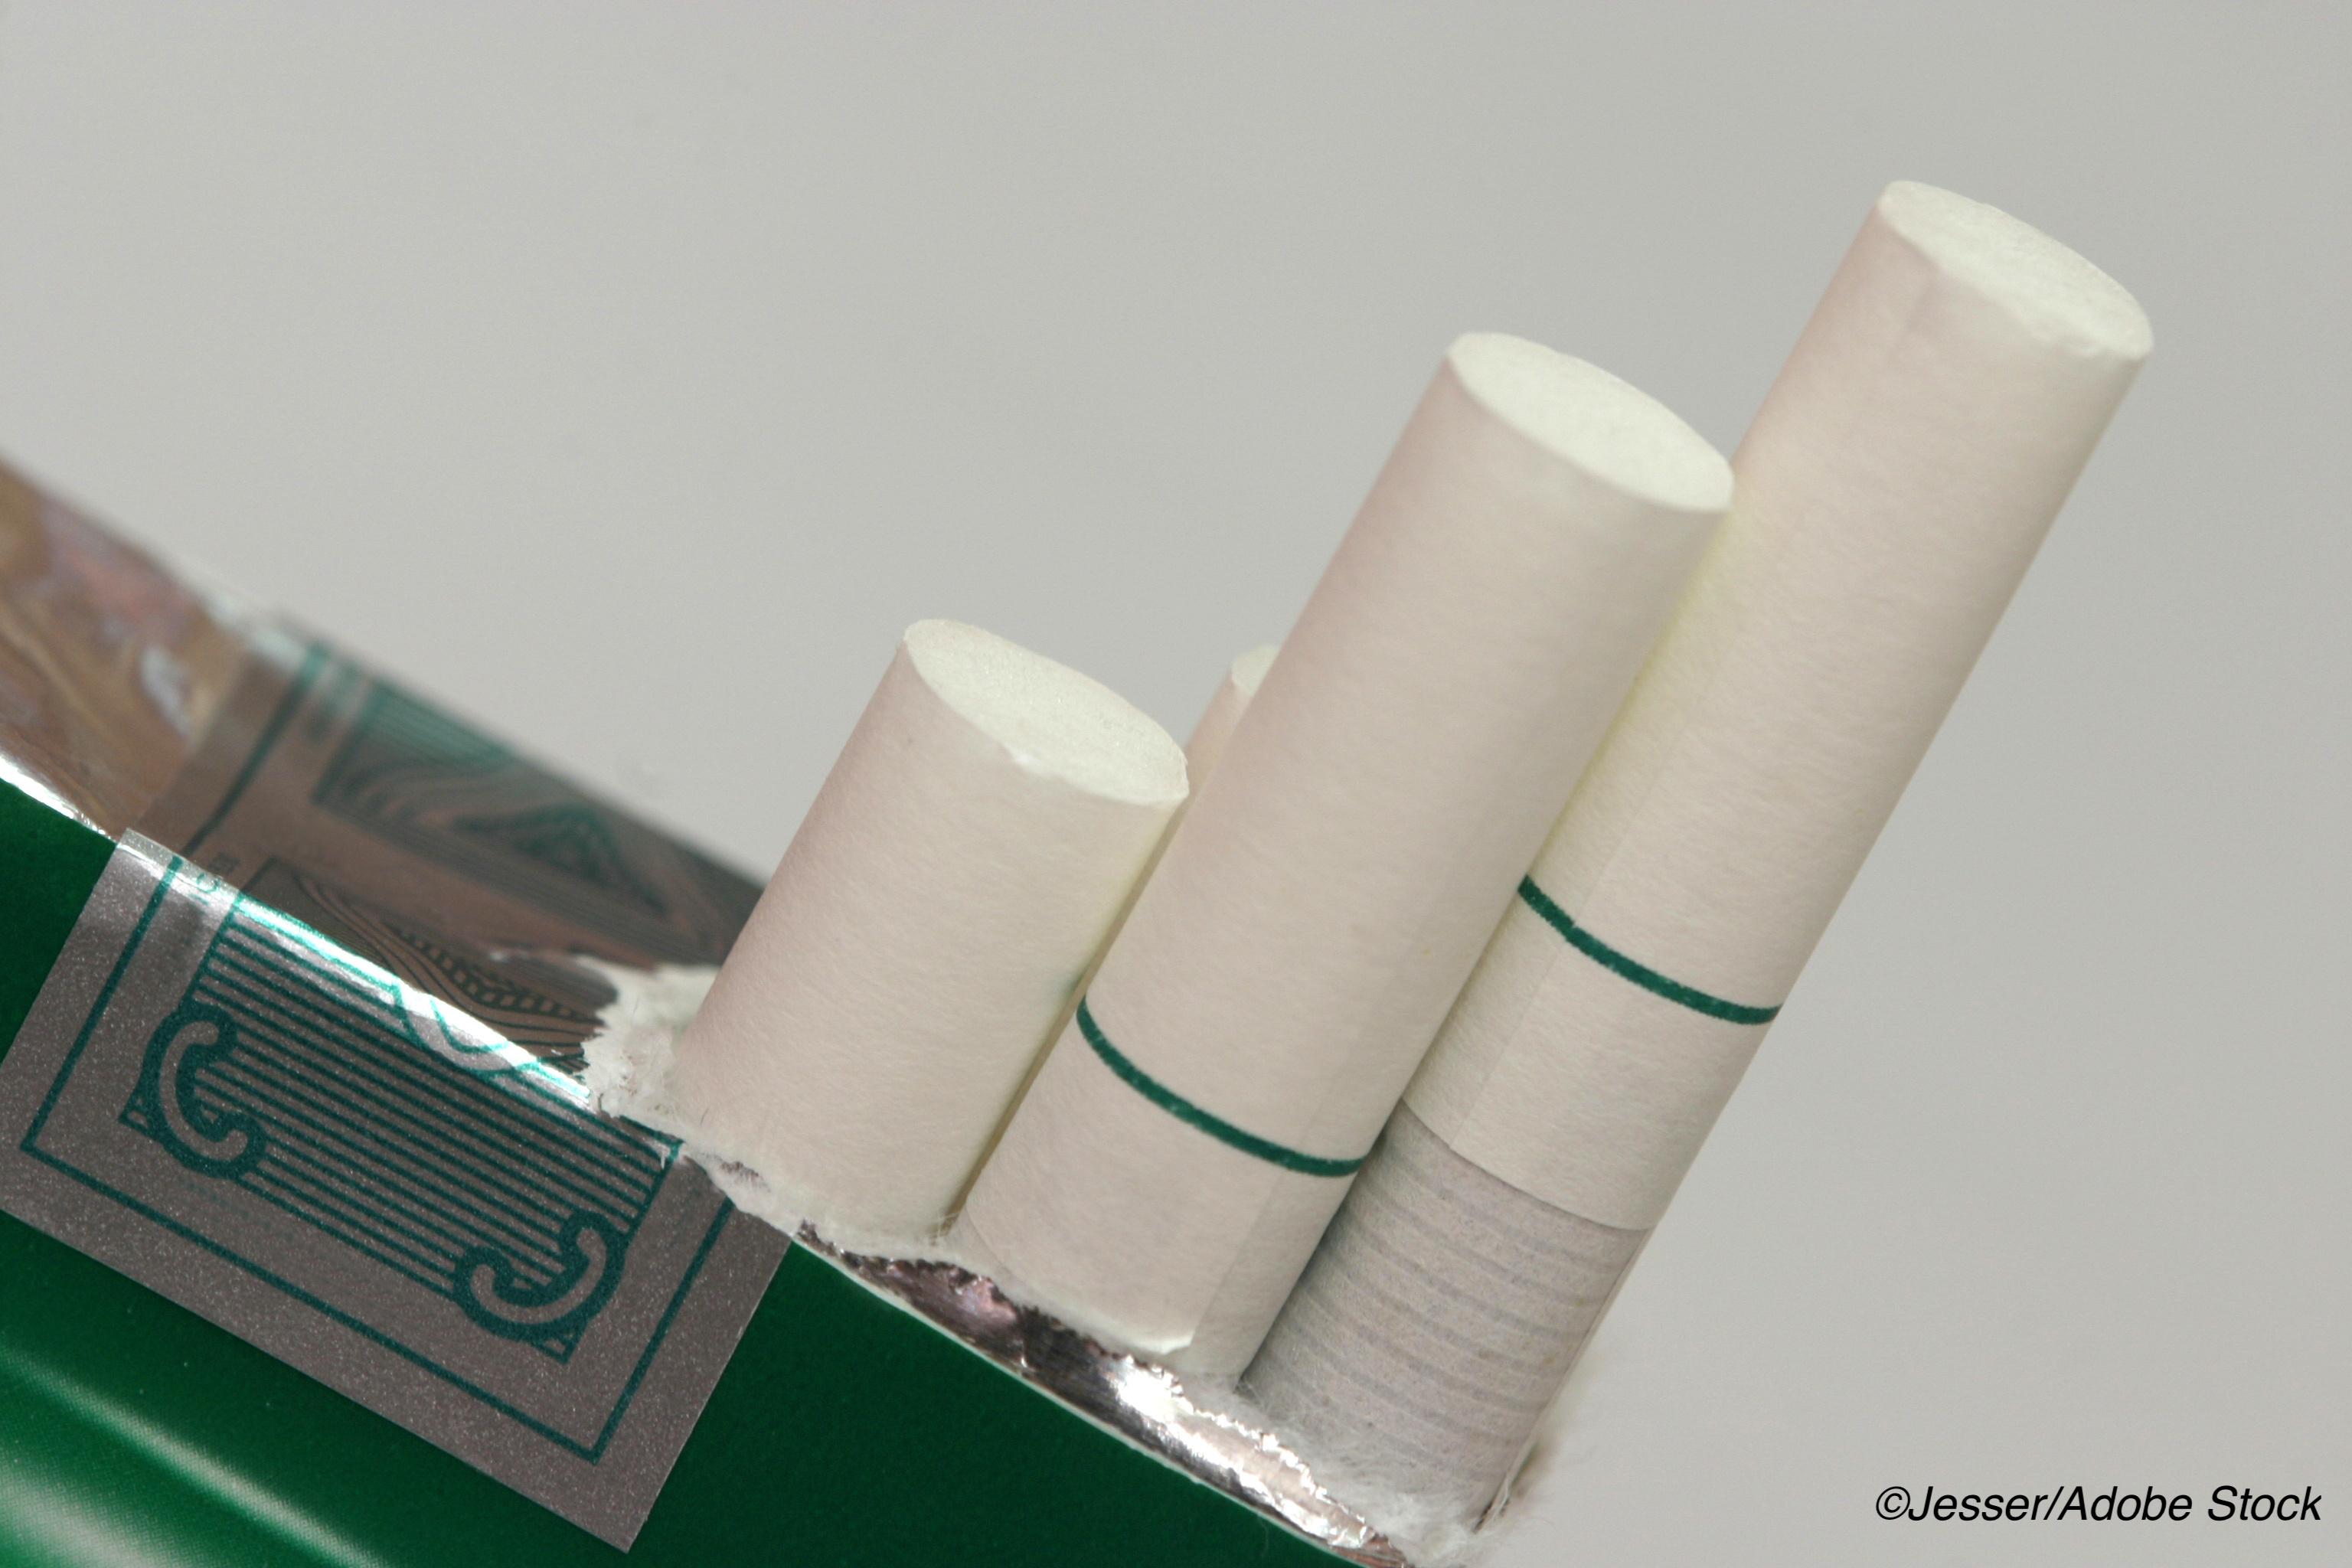 FDA Plans to Ban Menthol Cigarettes, Flavored Cigars